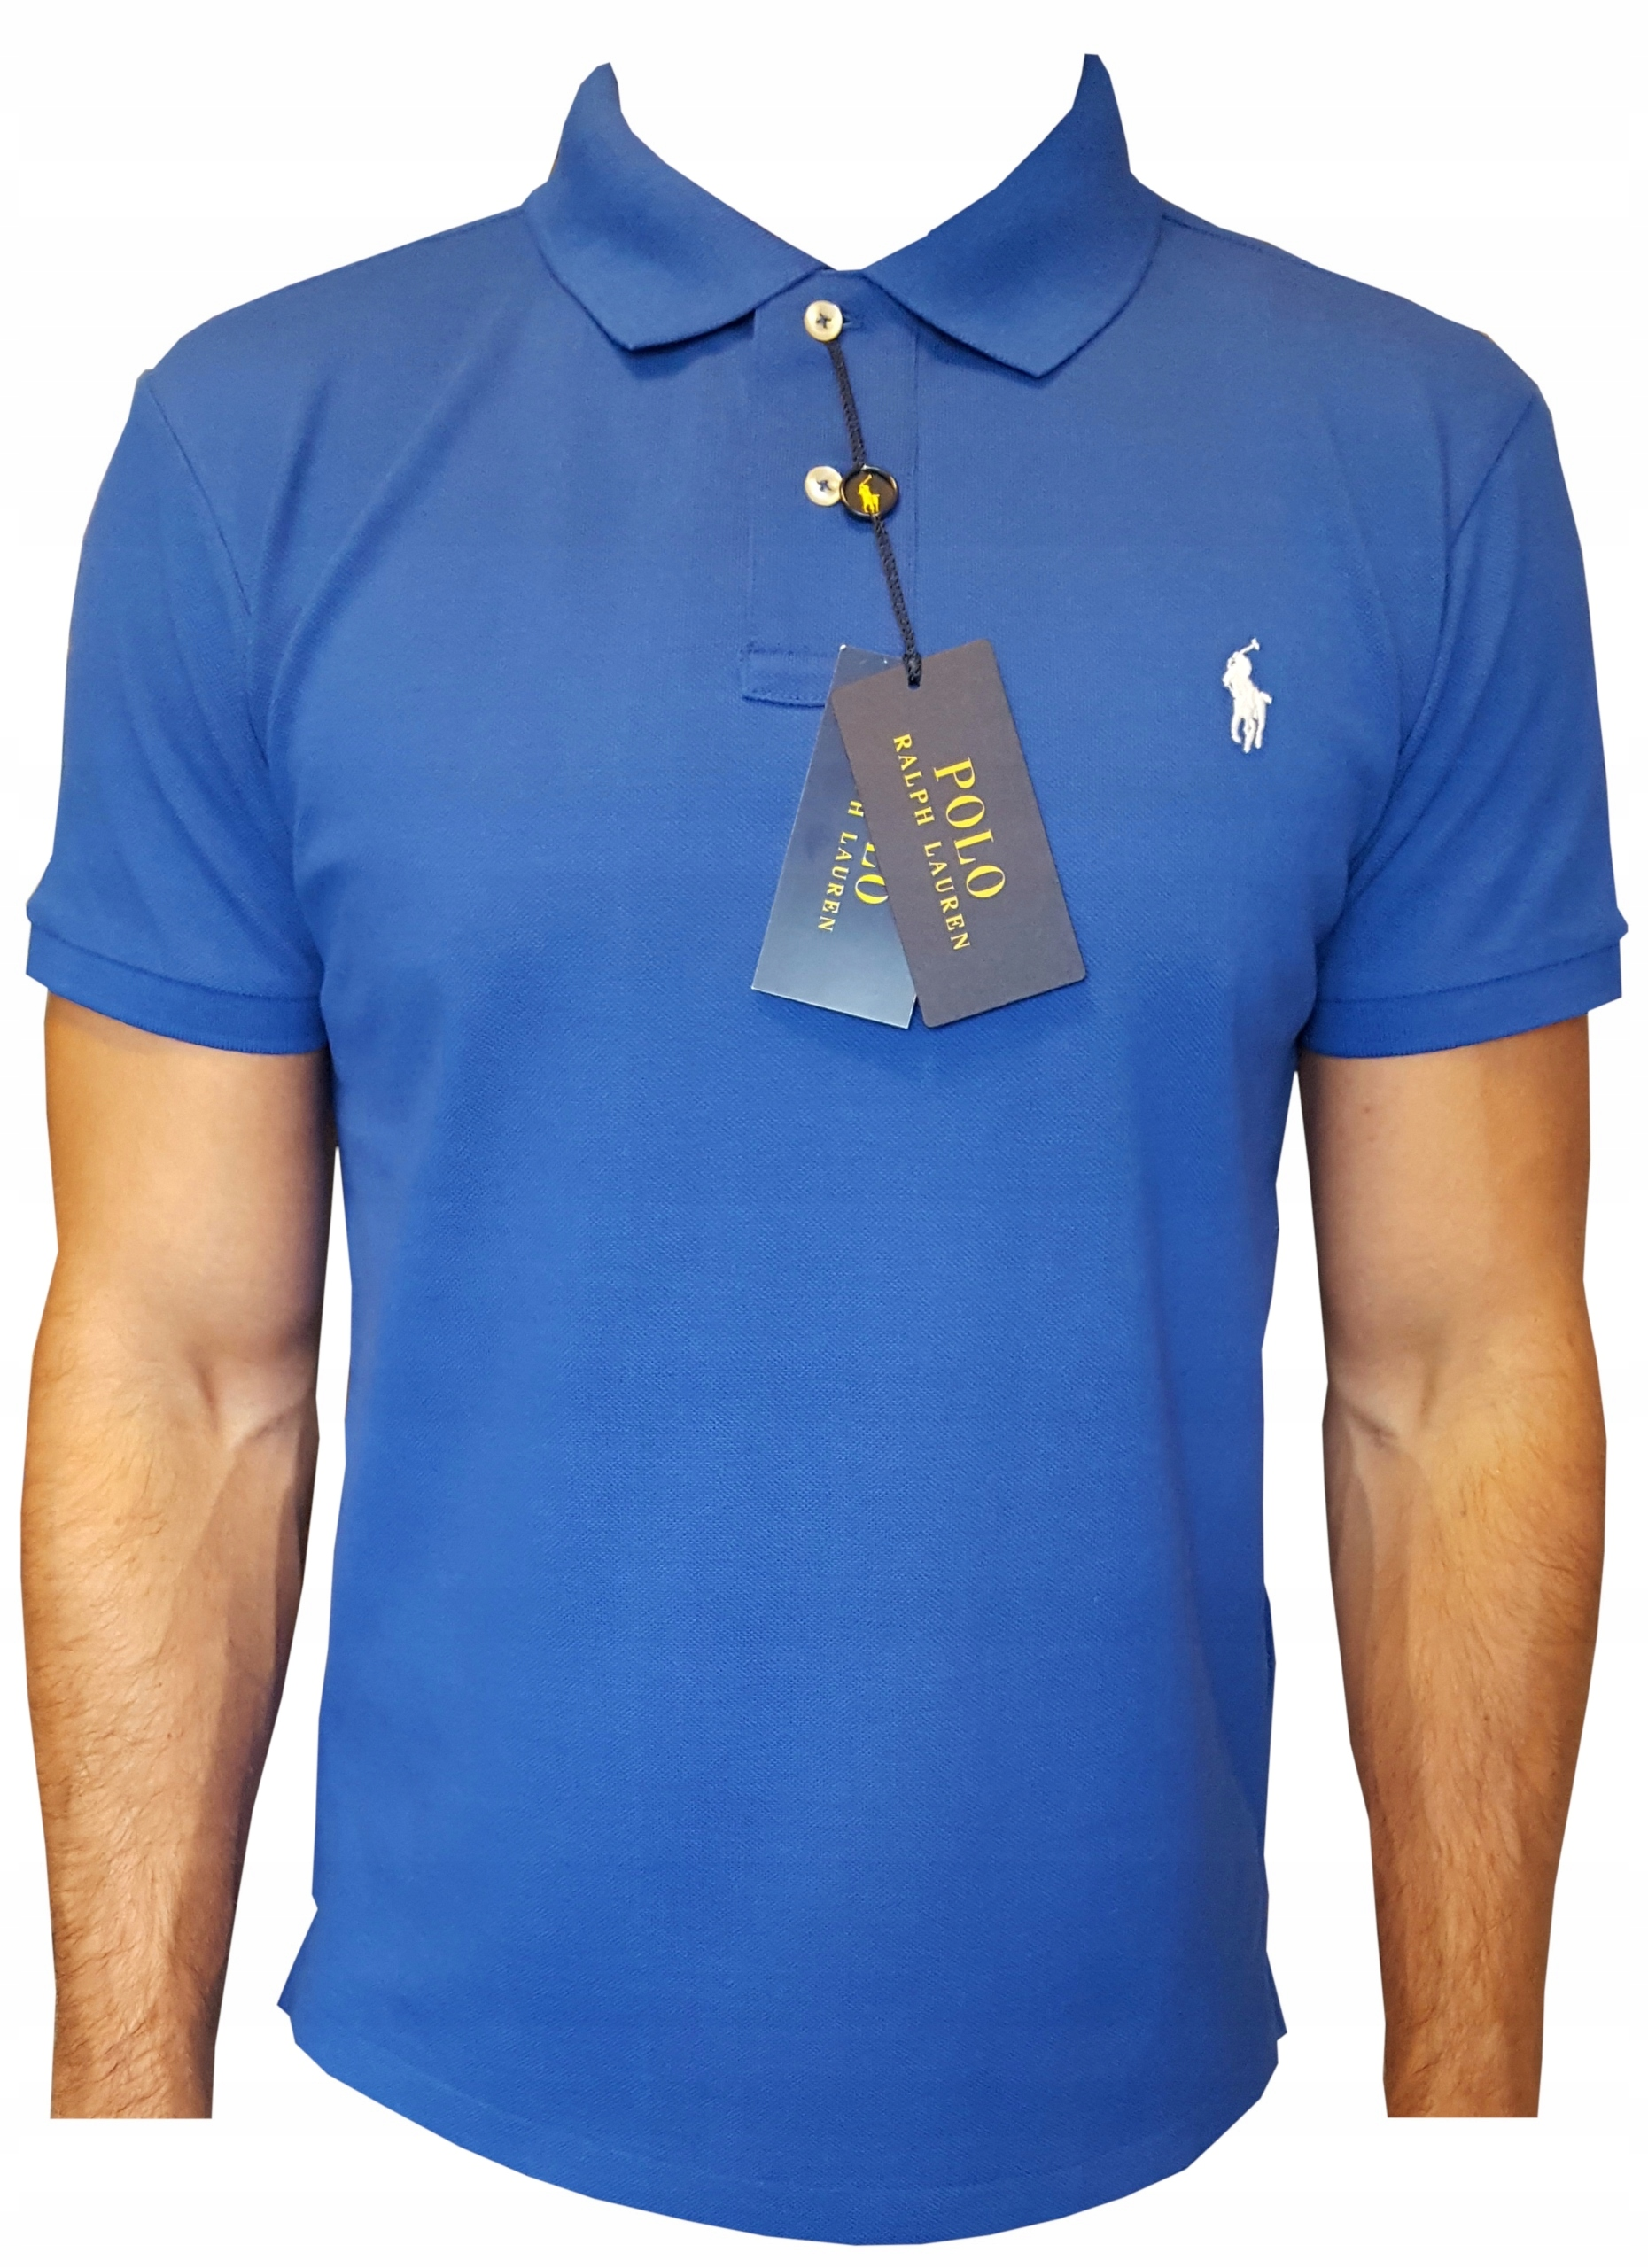 Lauren Koszulka Promocja Niebieska Ralph 7471835430 Polo Xl n0wk8PXO